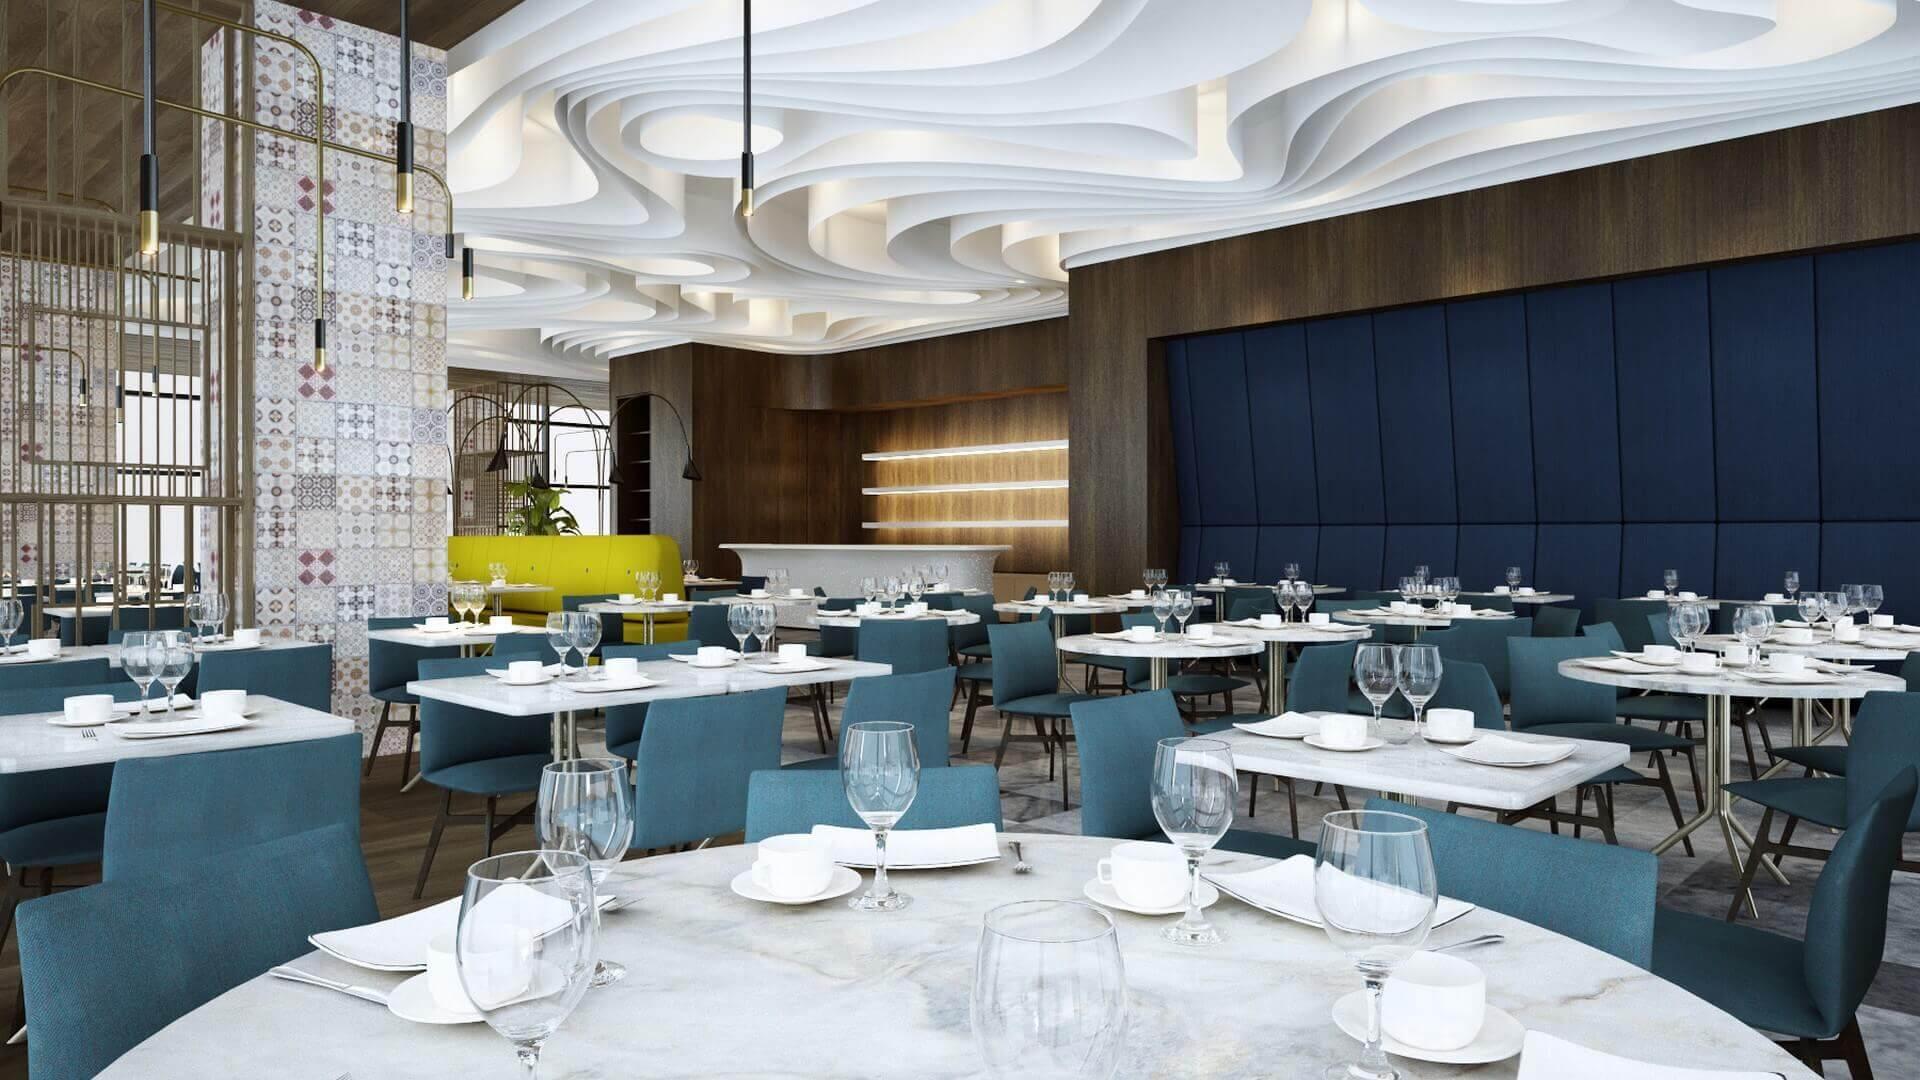 restoran mimar 2056 Tiflis Steakhouse Restoranlar